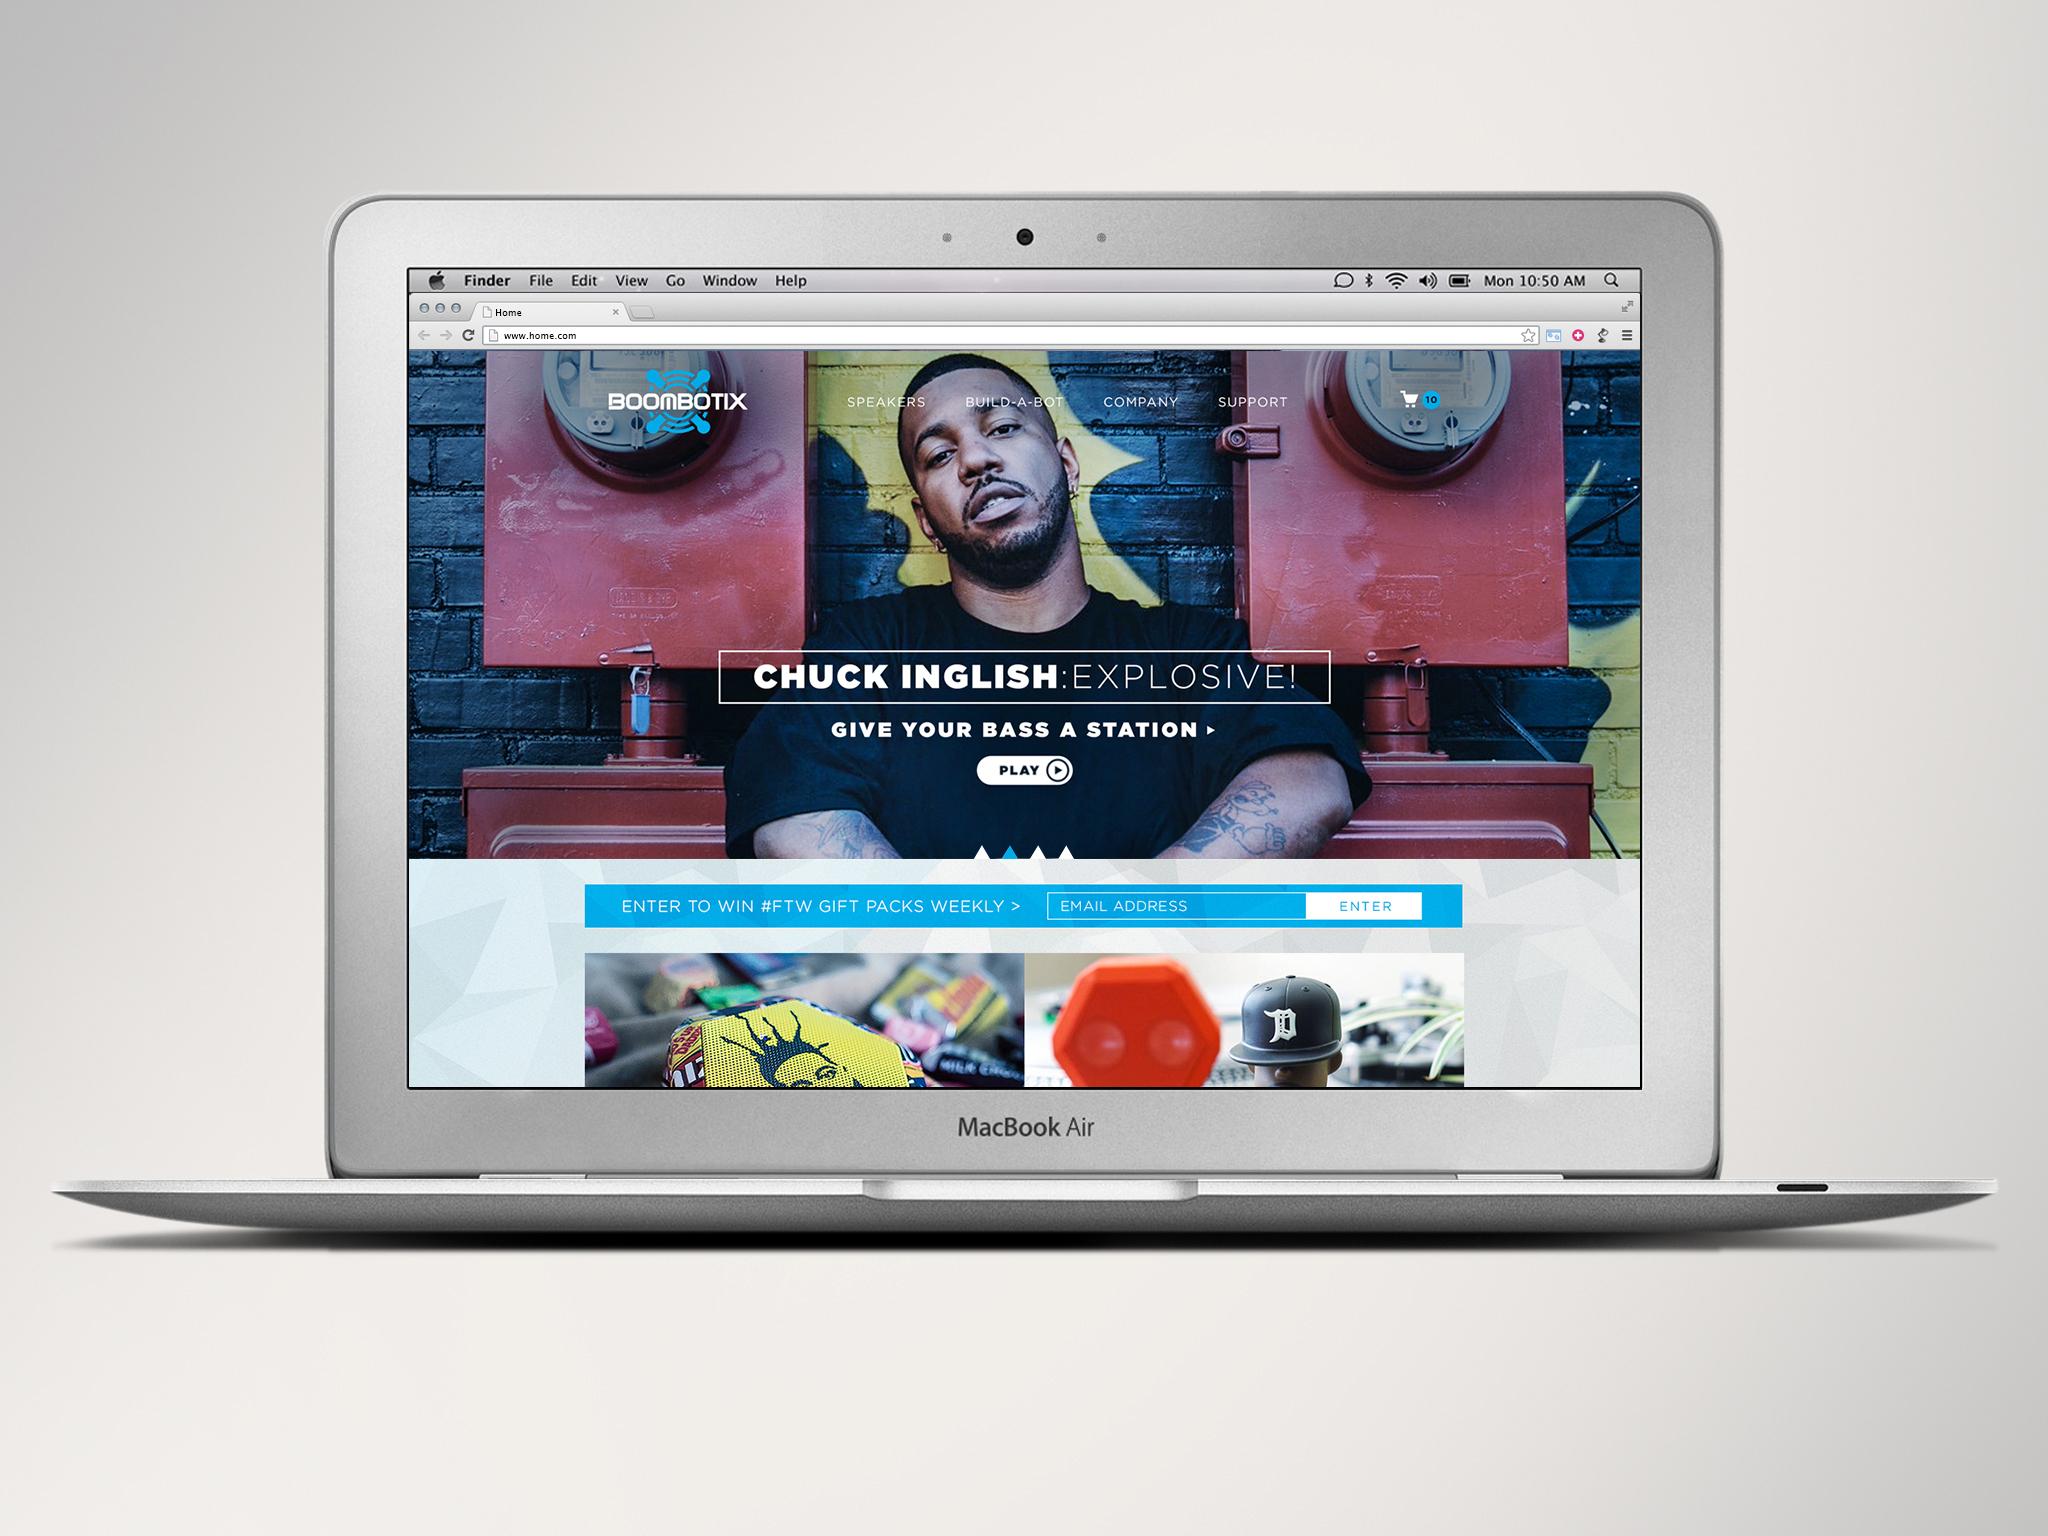 Boombotix website on computer featuring Chuck Inglish